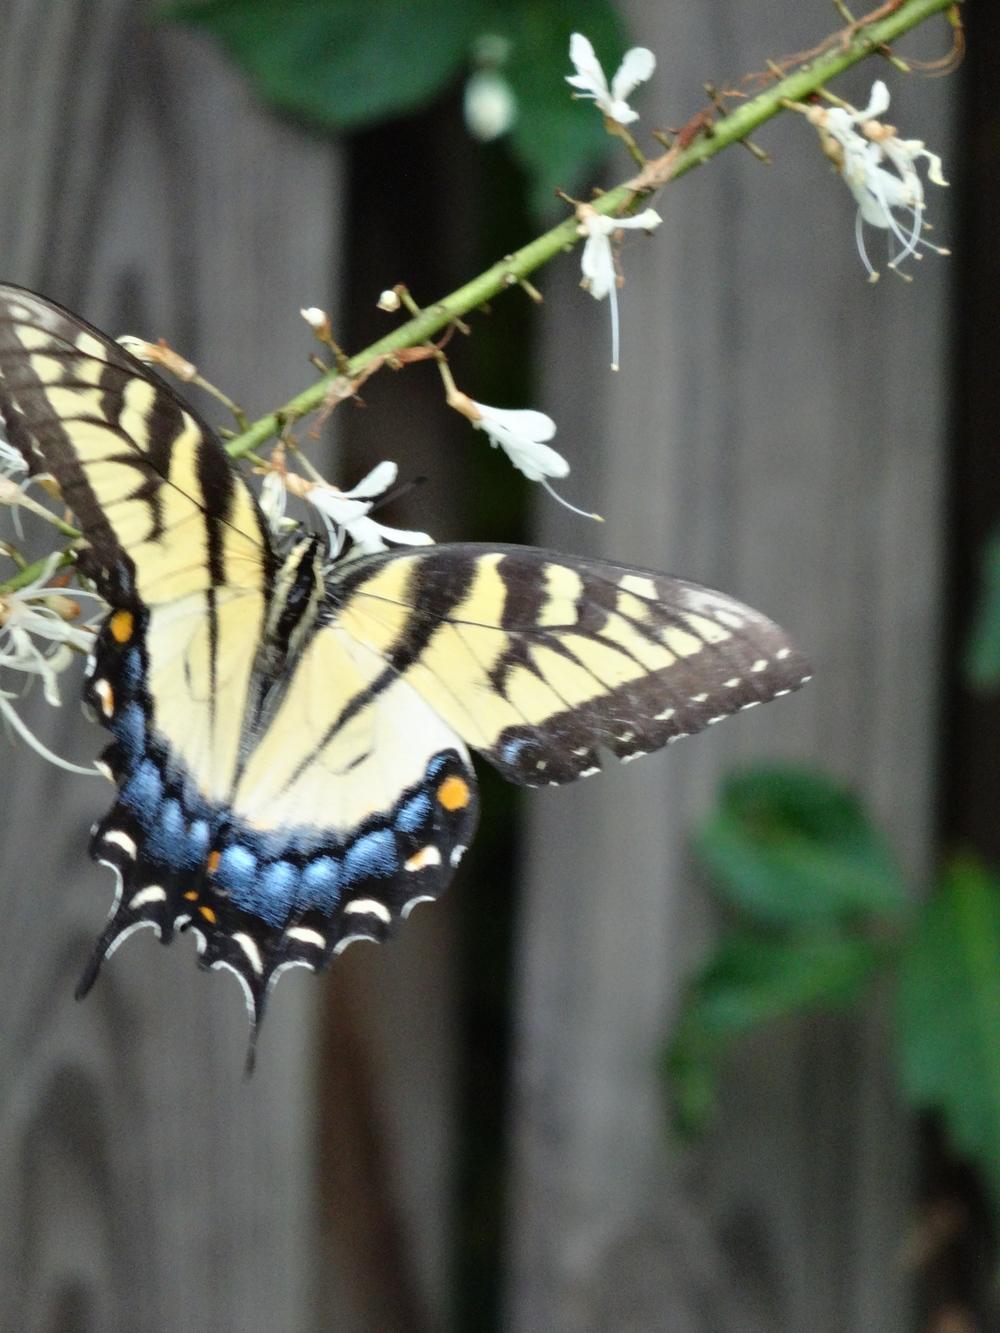 Tiger swallowtail on bottlebrush buckeye